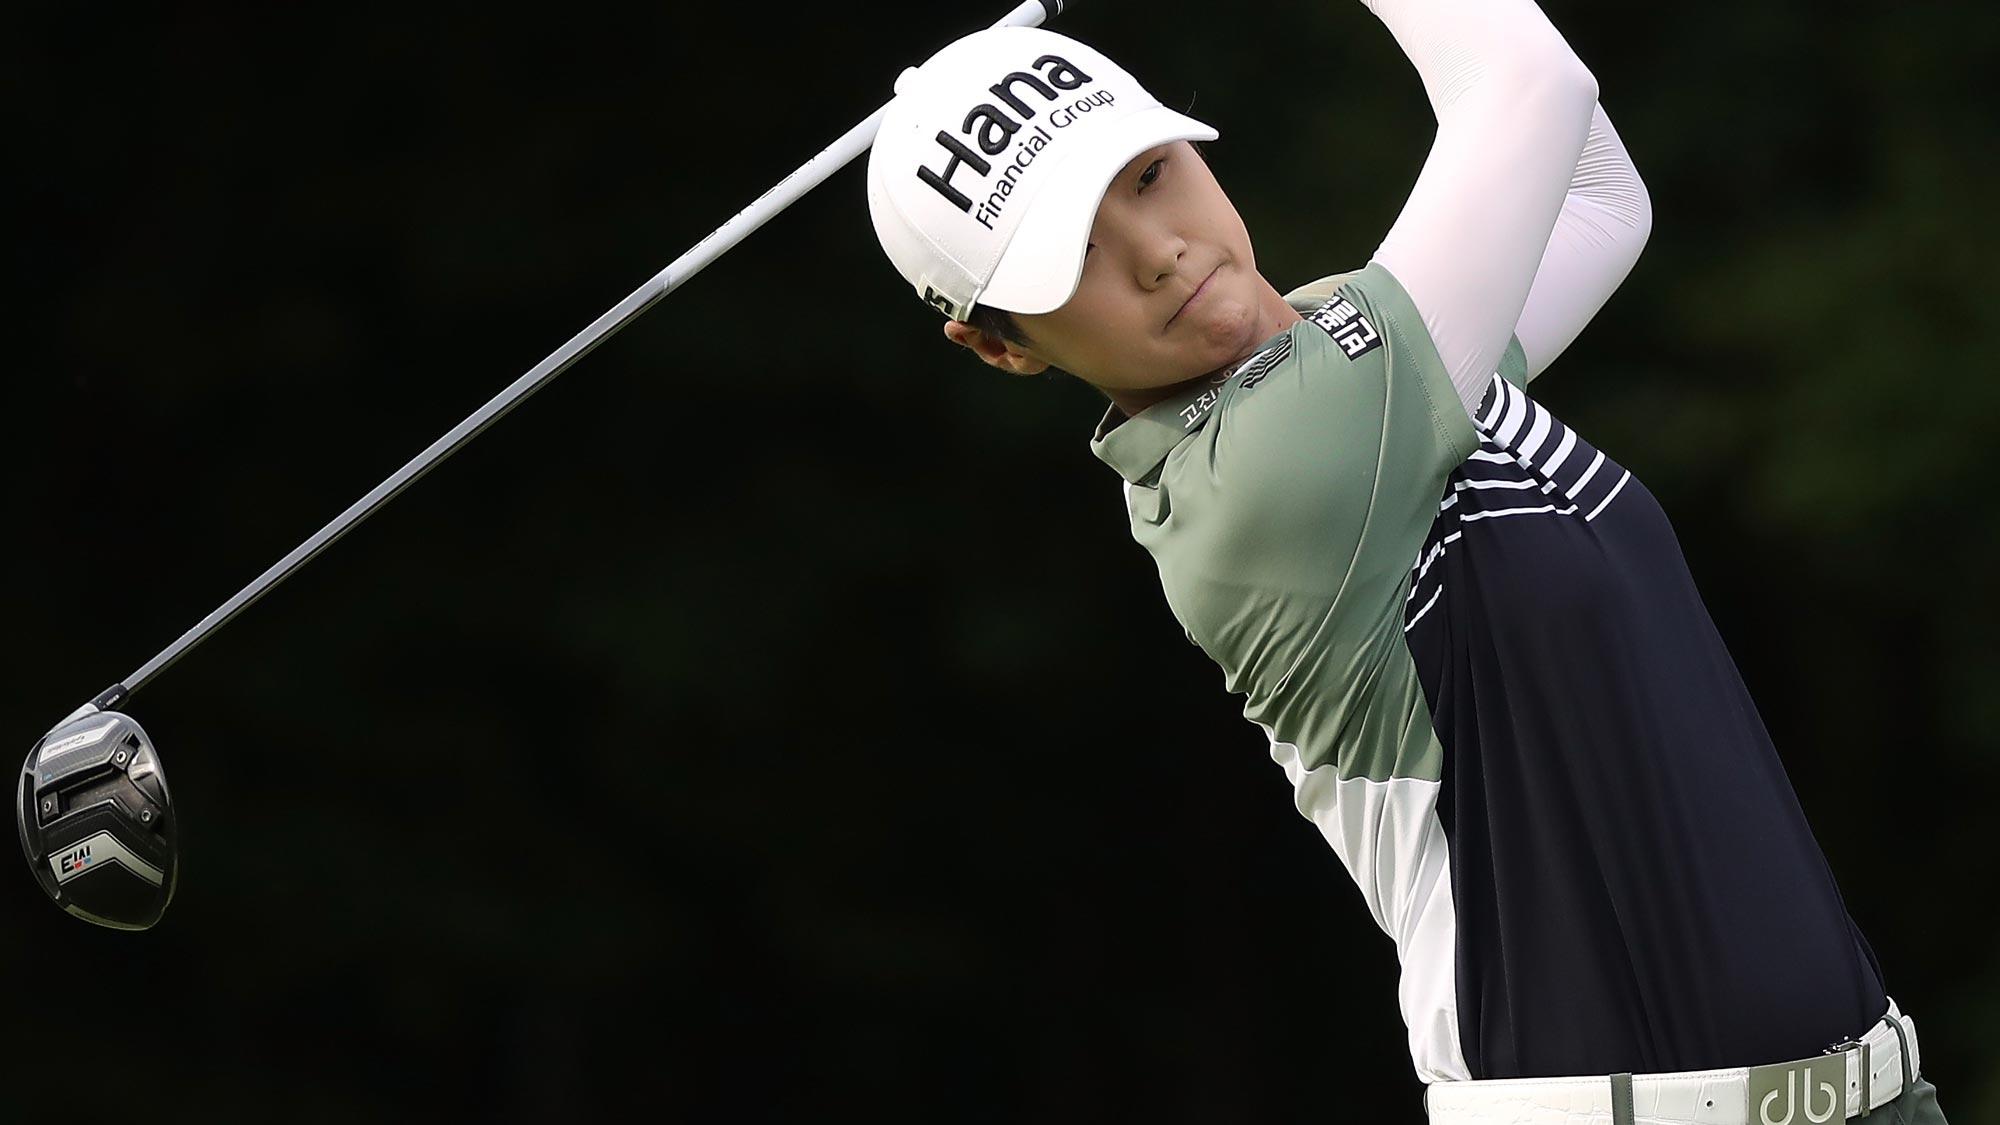 Aditi Ashok off to steady start in Women's PGA Championships